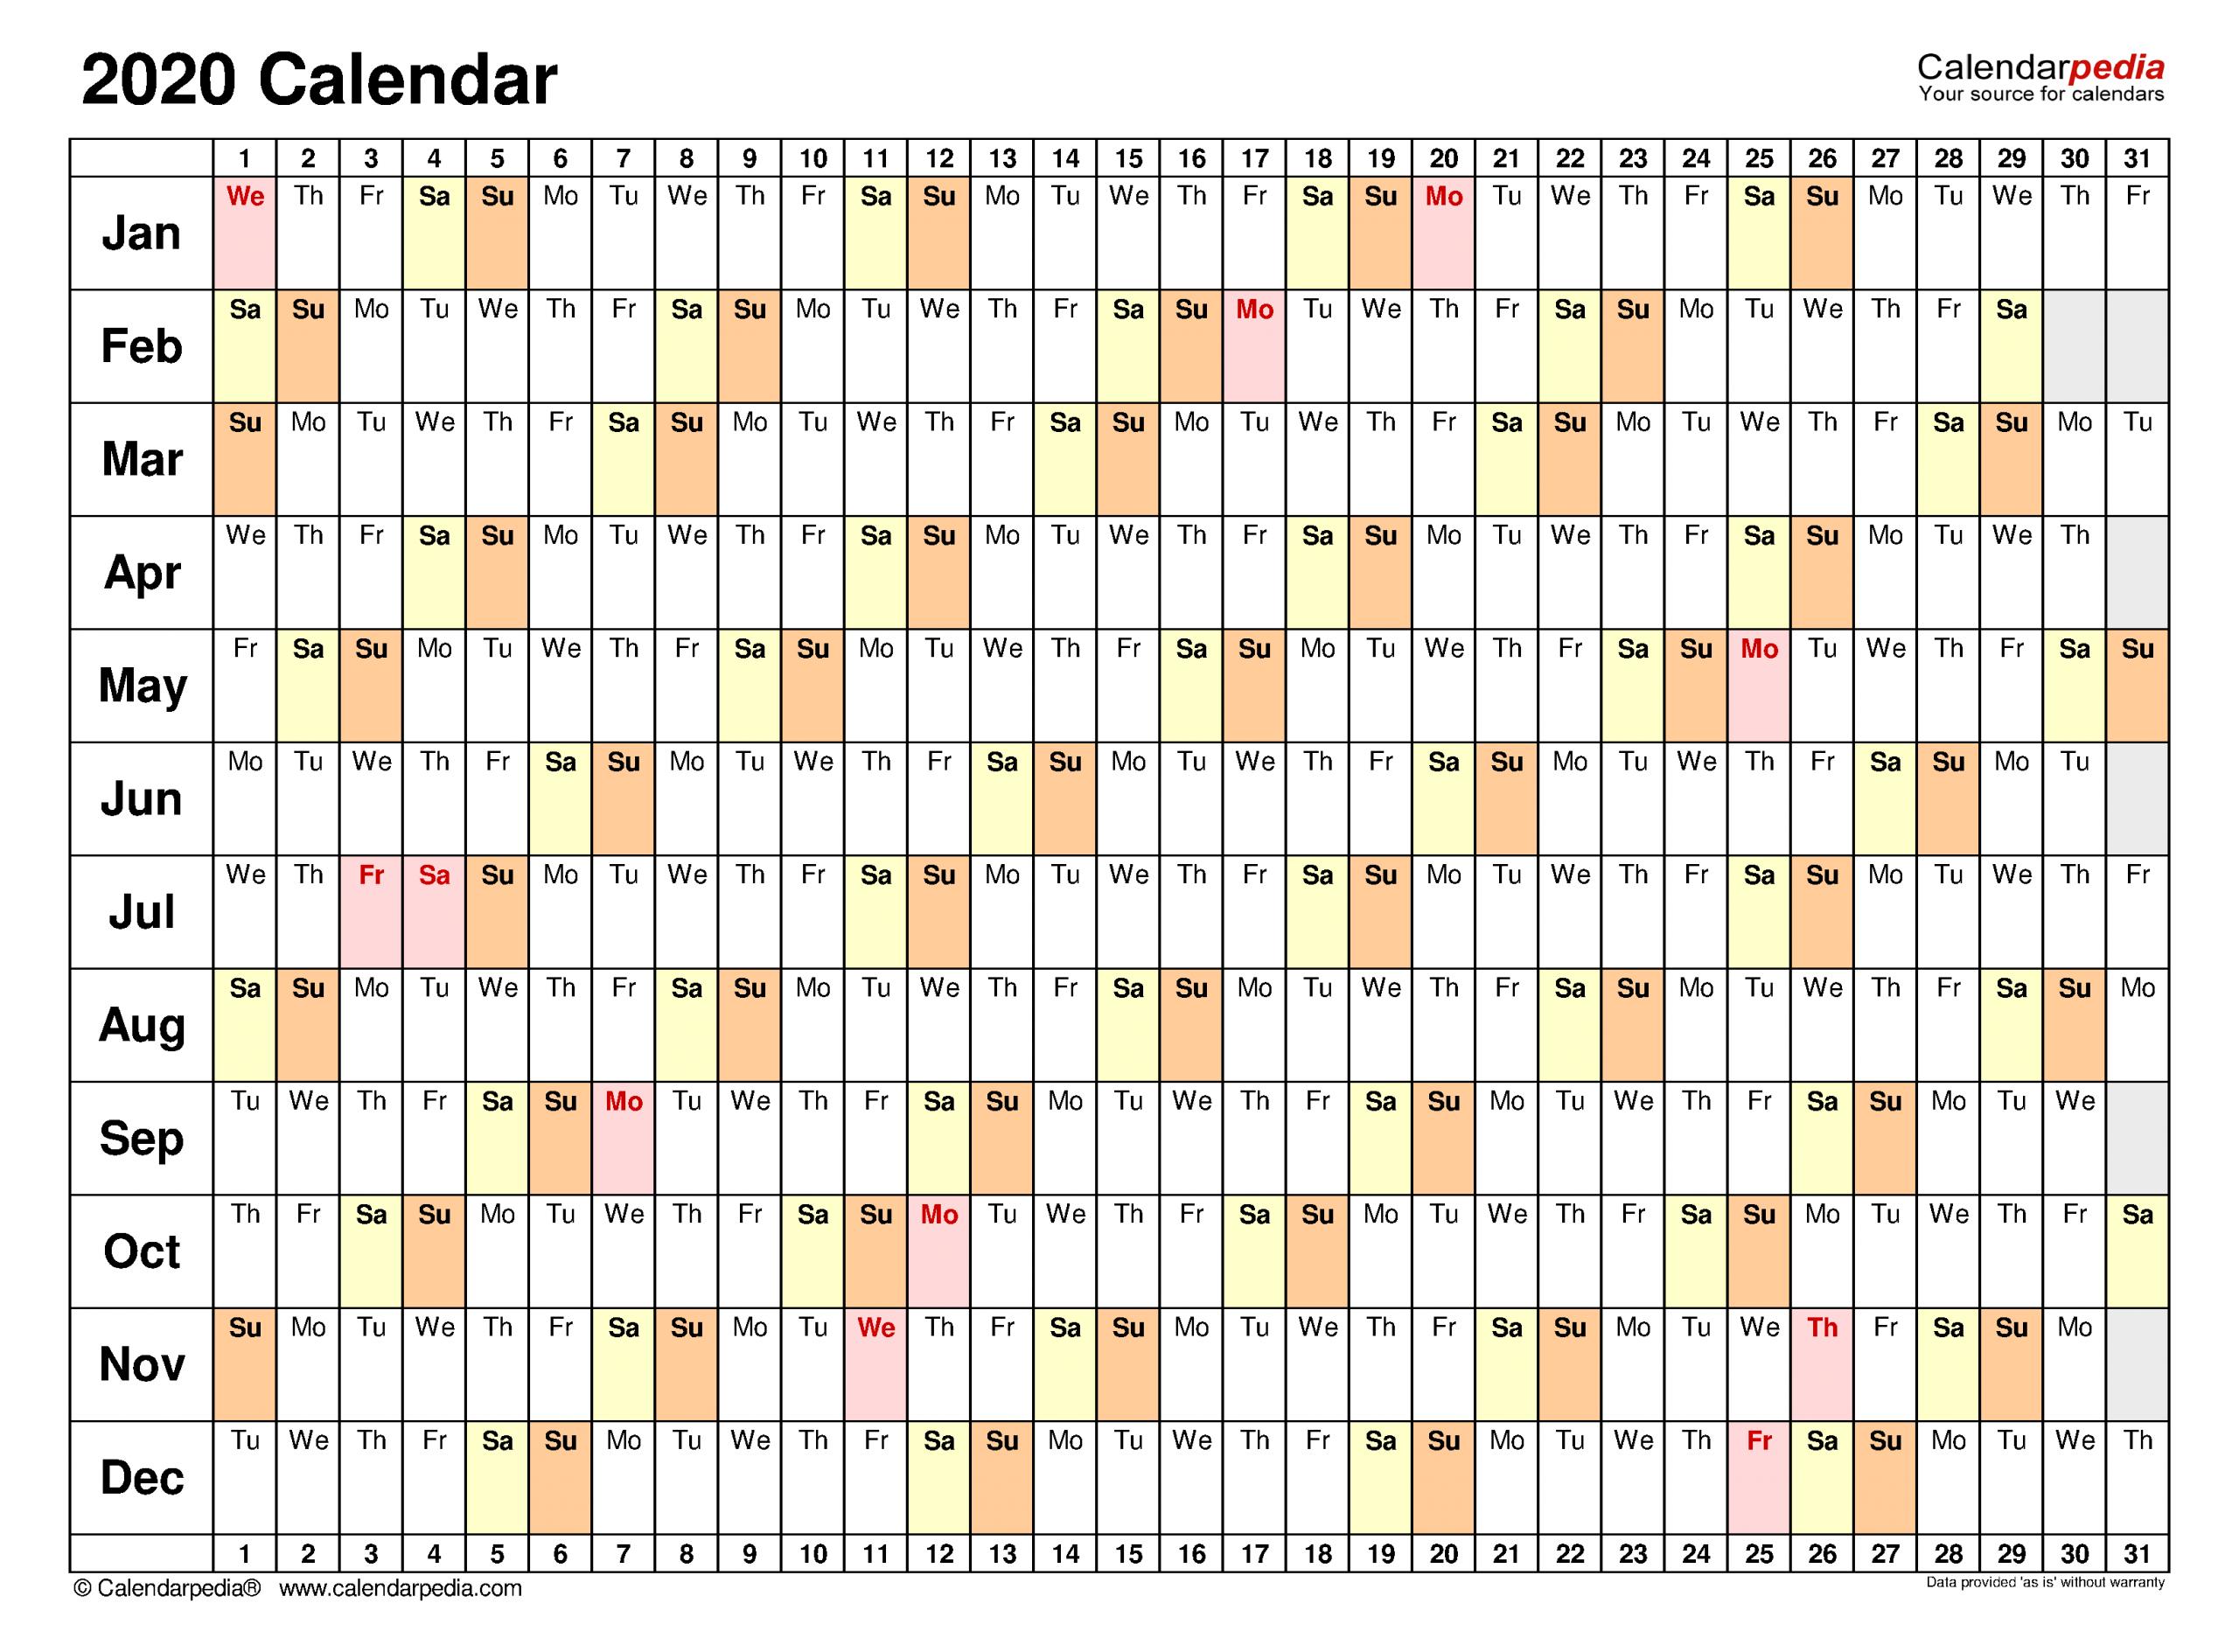 2020 Calendar - Free Printable Pdf Templates - Calendarpedia